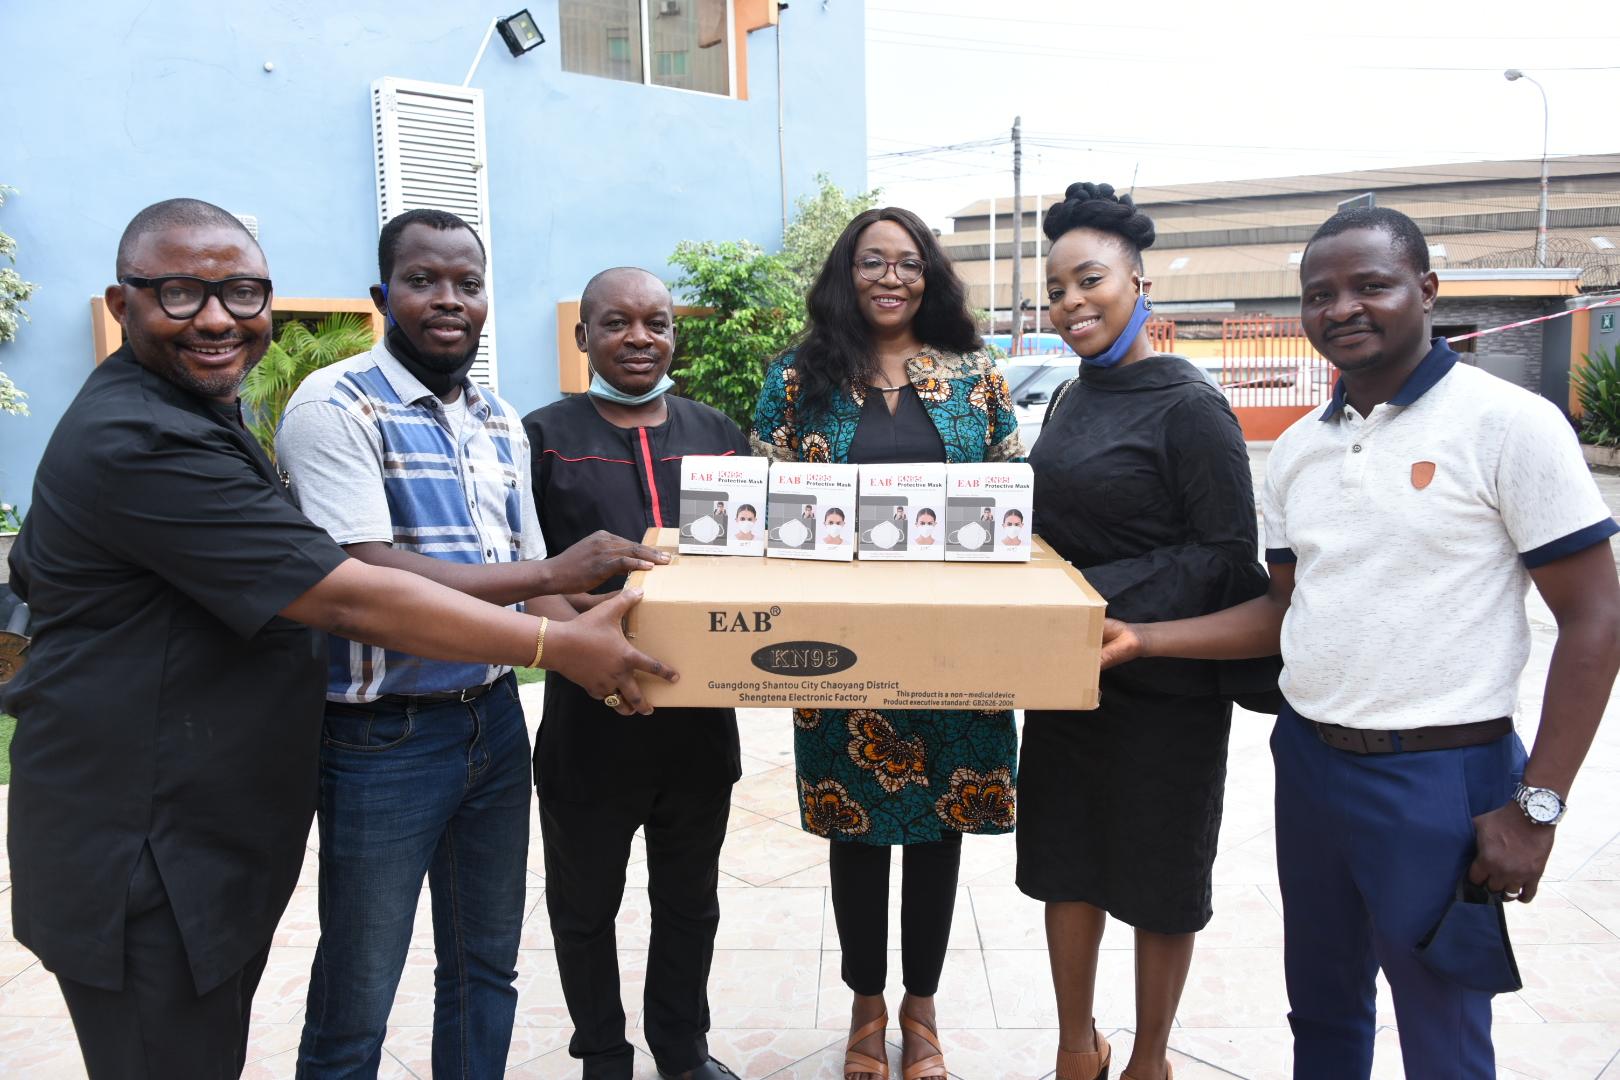 MultiChoice Nigeria visits BJAN, donates PPE to prevent COVID-19 spread - Brand Spur